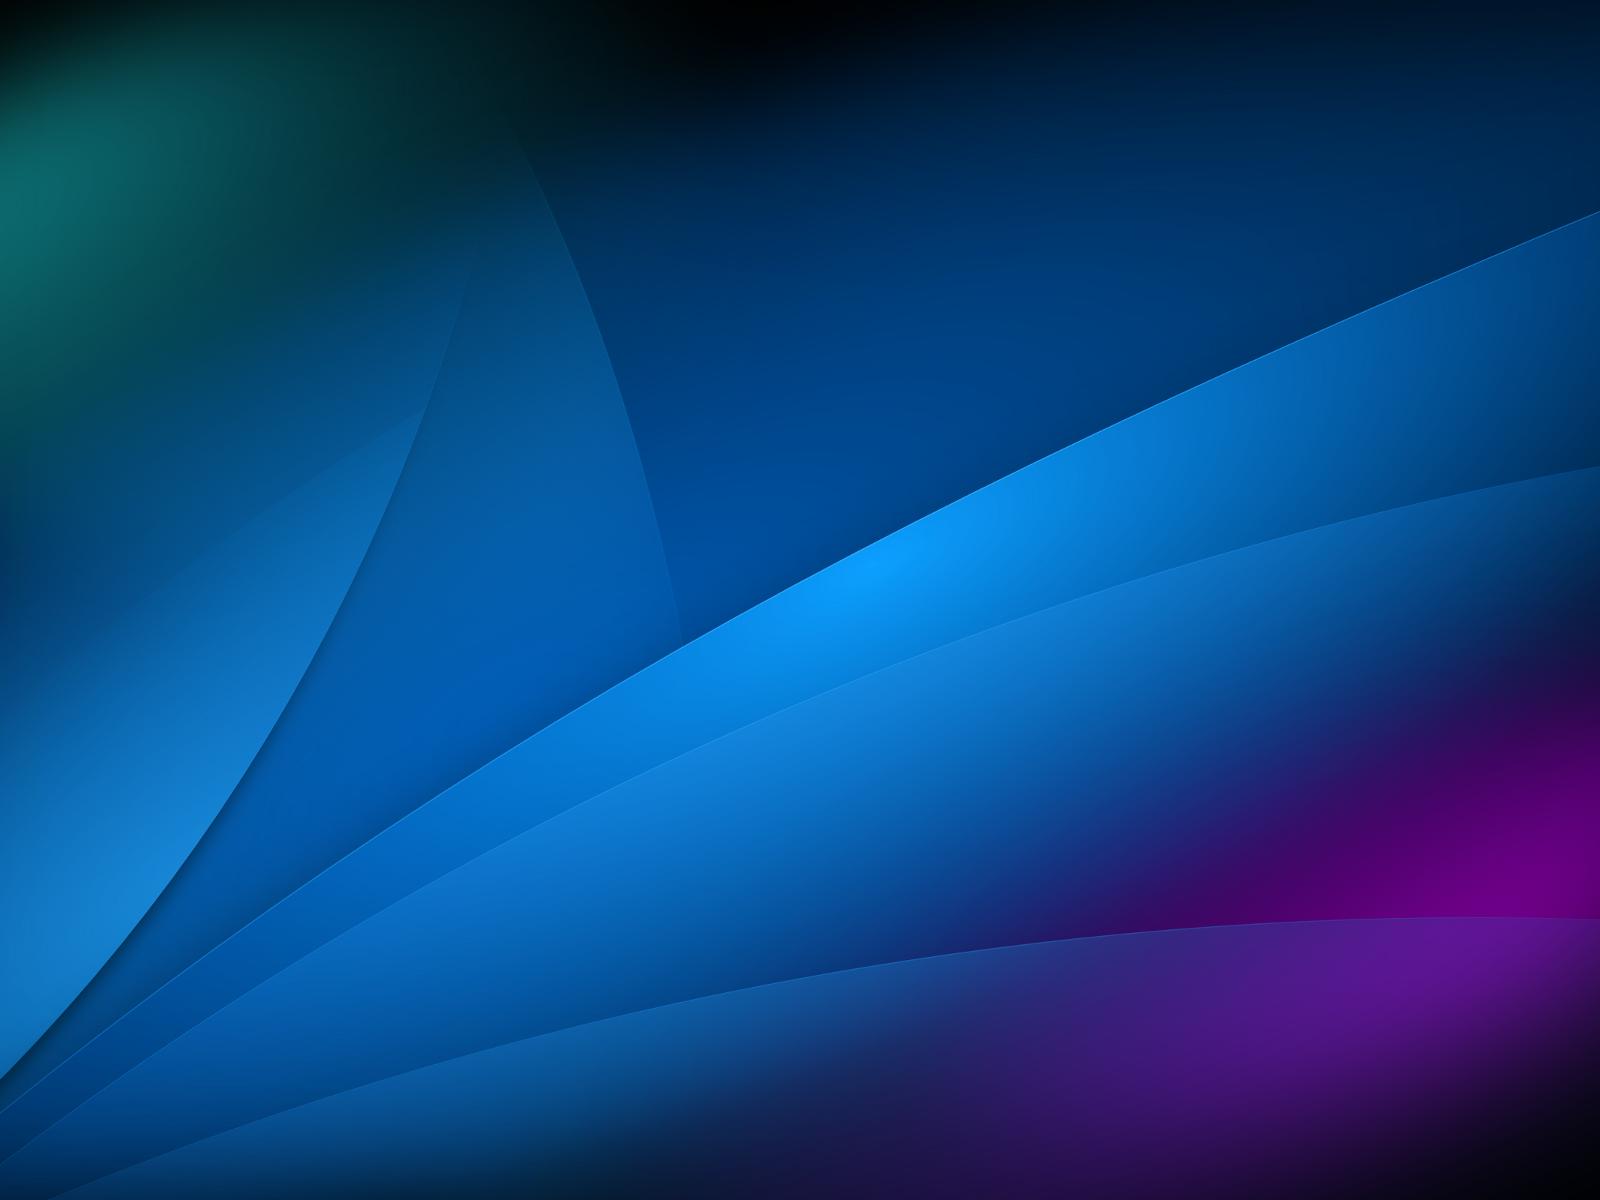 kubuntu wallpaper 1920x1080 - photo #10